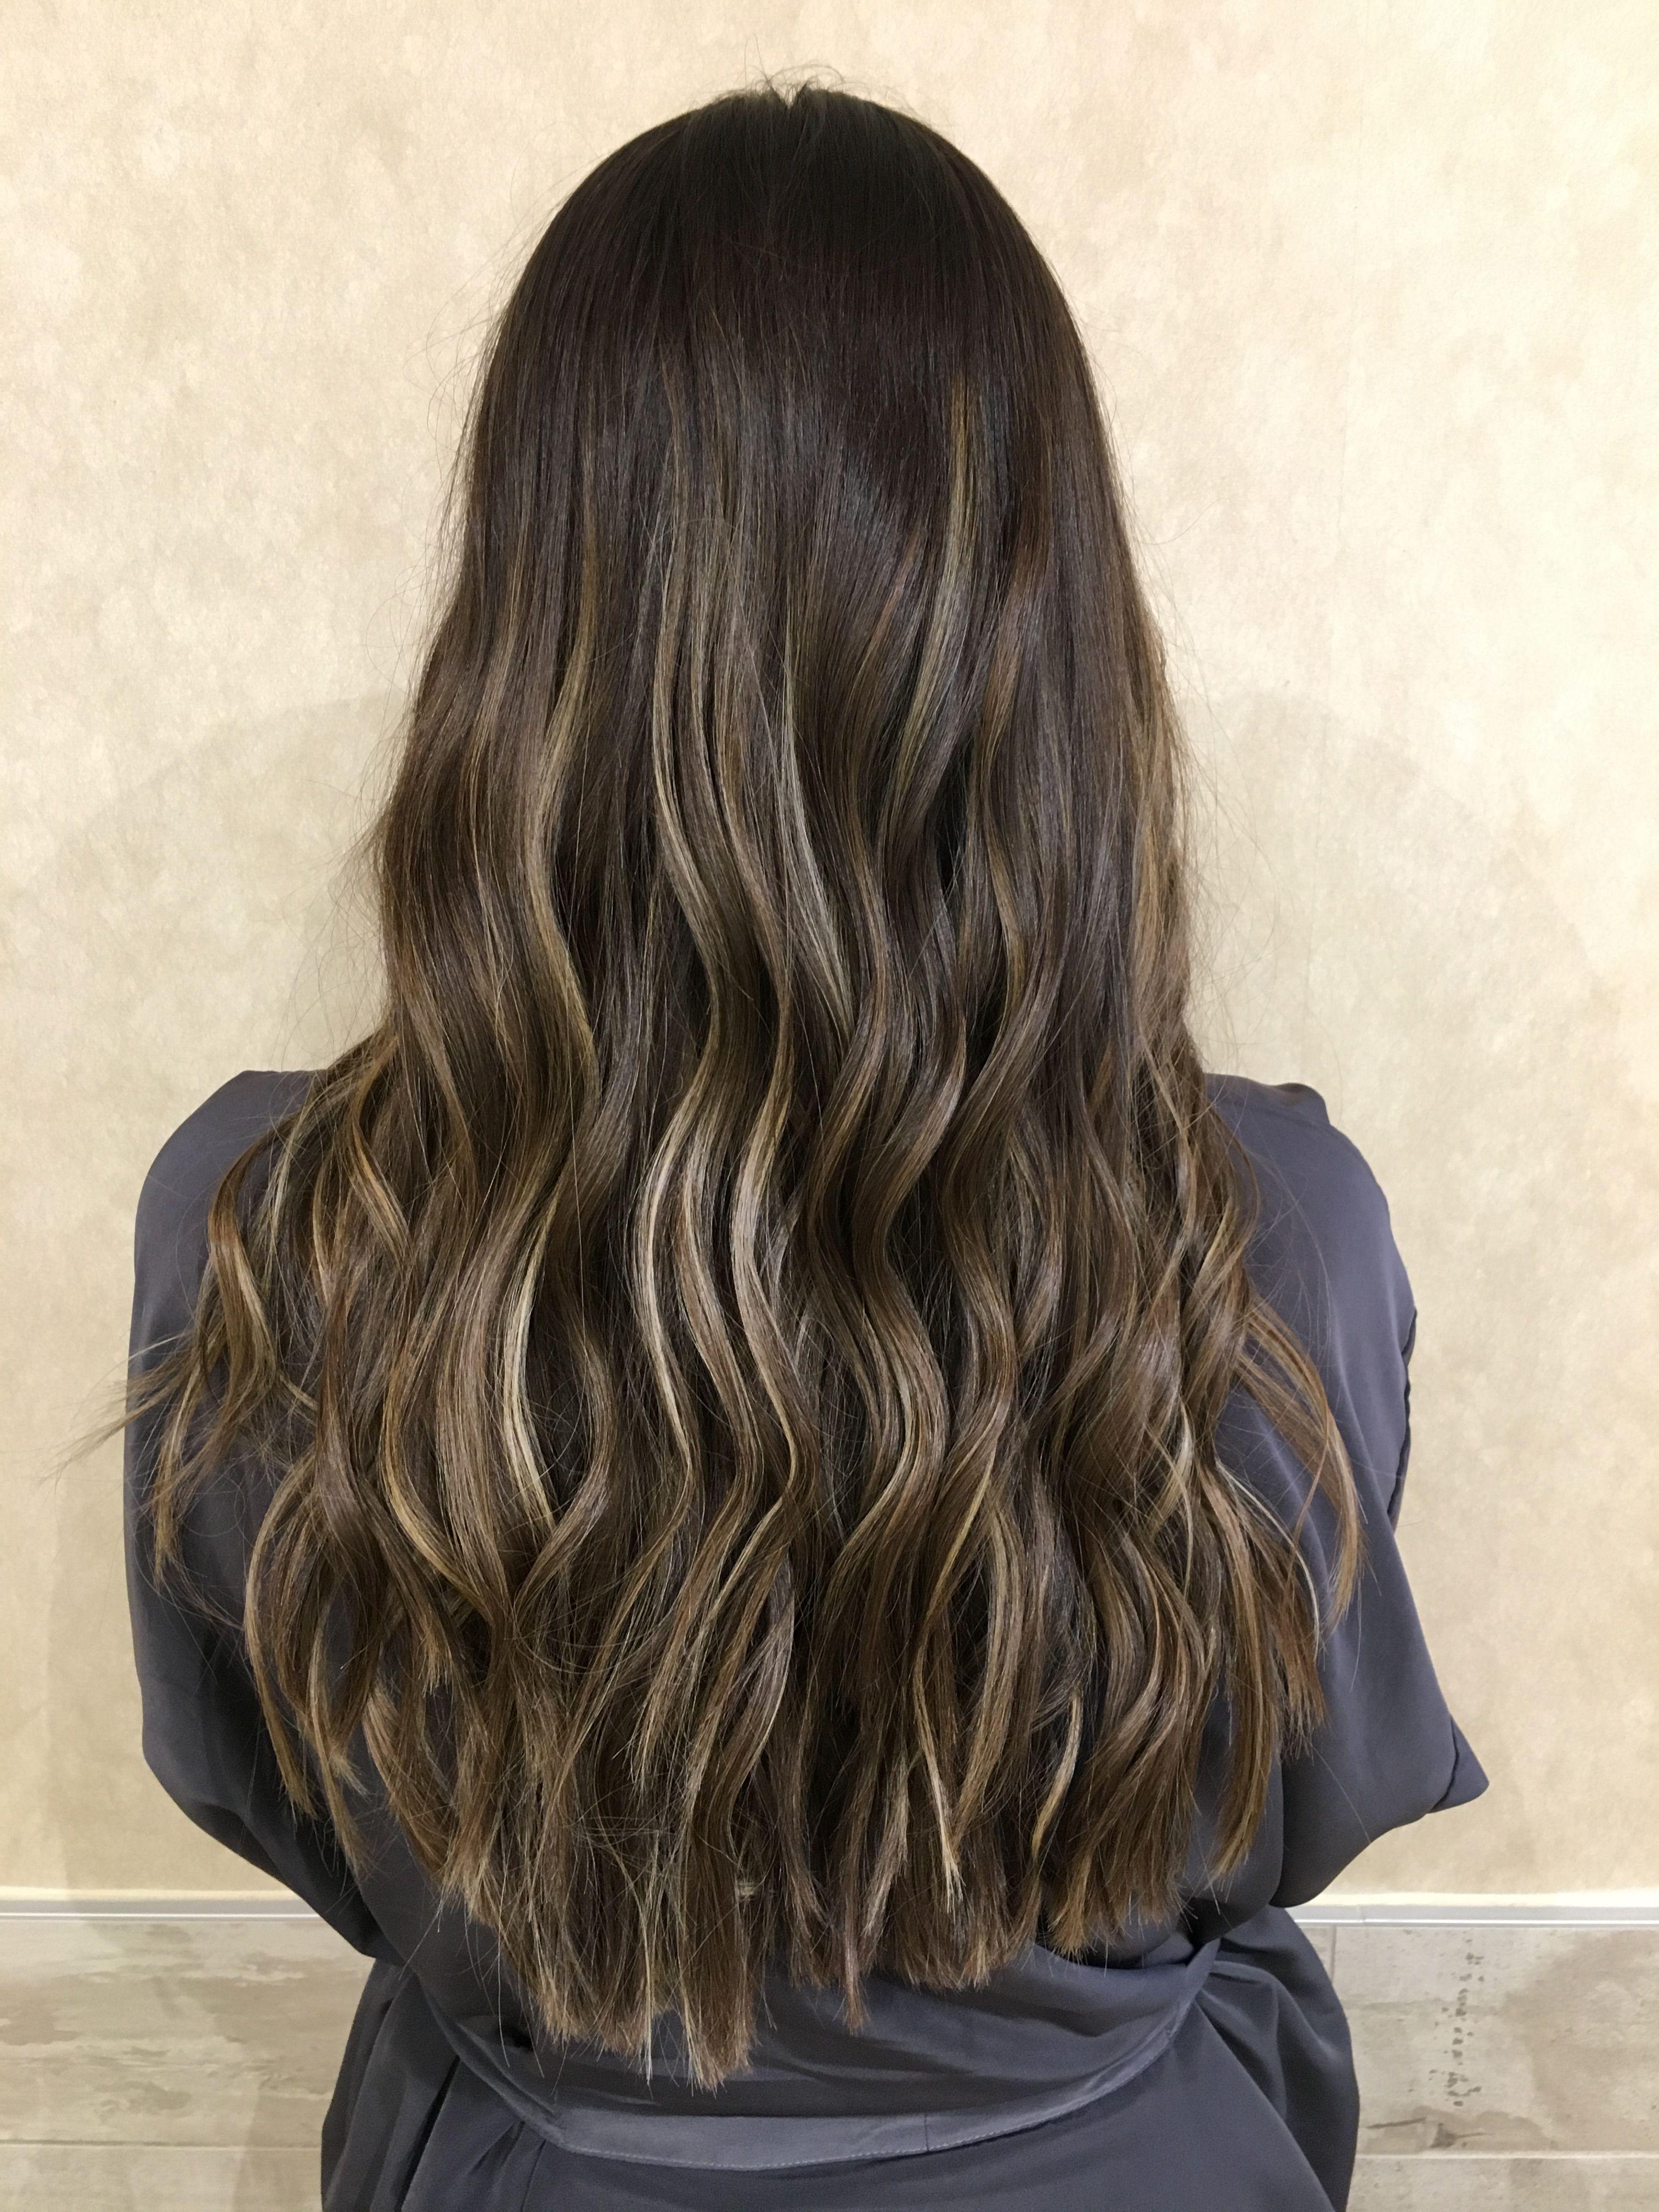 Subtle Balayage For Brunettes #balayage #besthair #brunette Vanity Salon  Houston Tx Http: